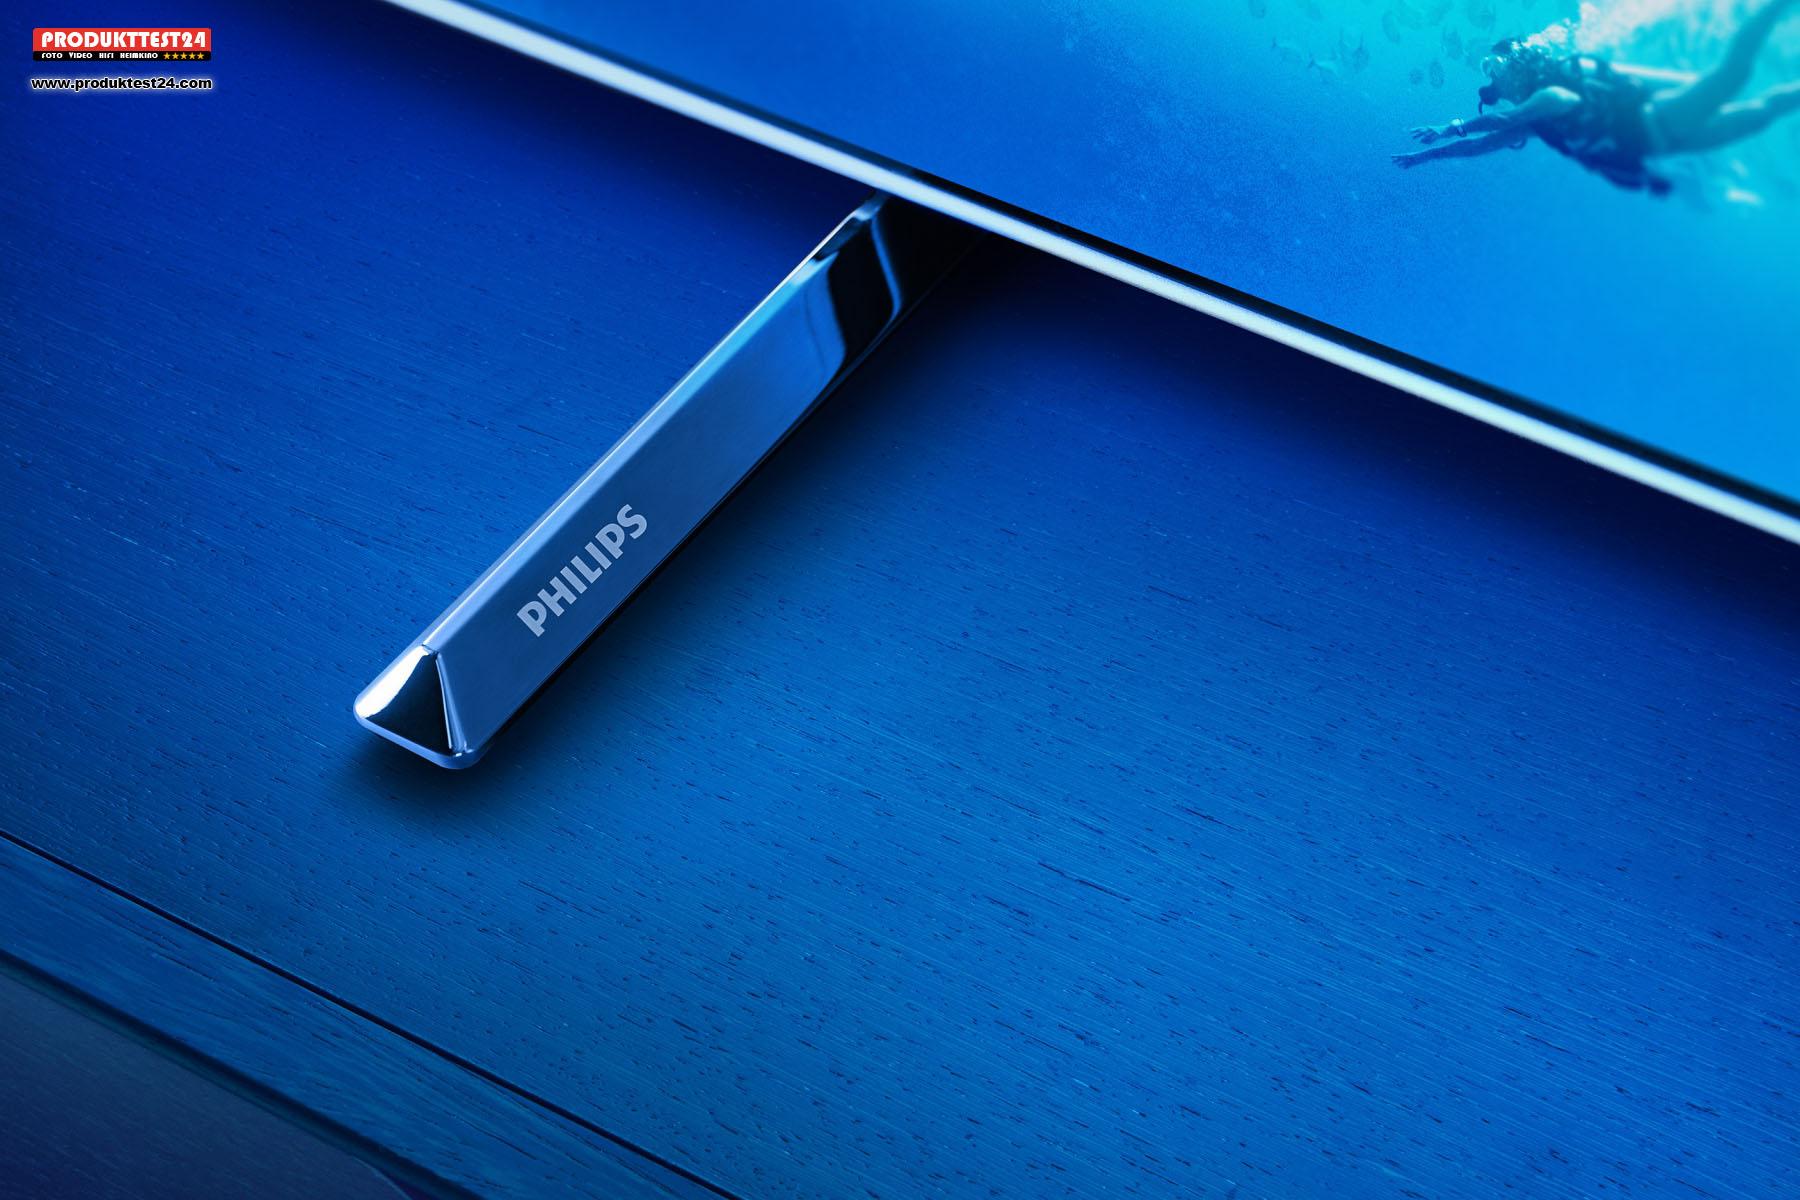 Edles Design. Rahmen und Standfuß des Philips 65OLED805/12 aus echtem Metall.